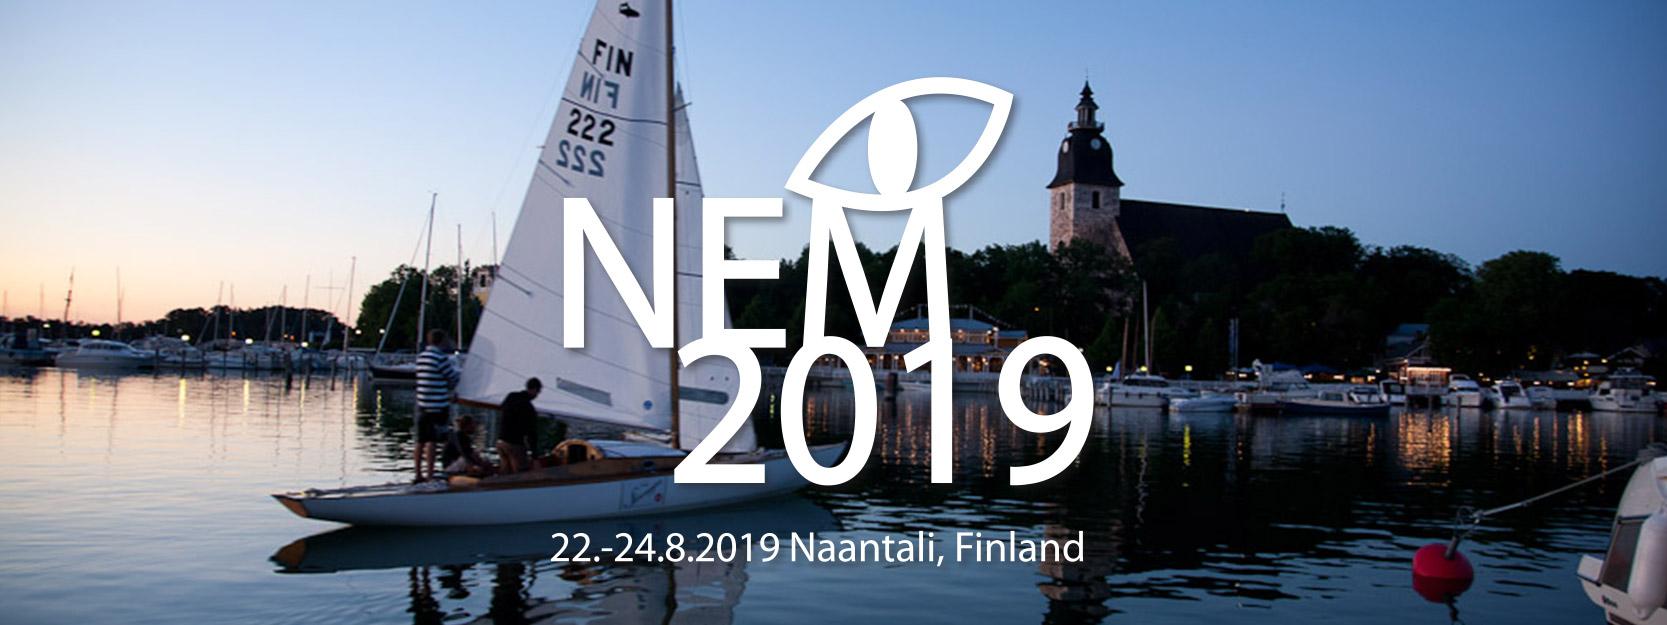 Nordic Eye Meeting 2019